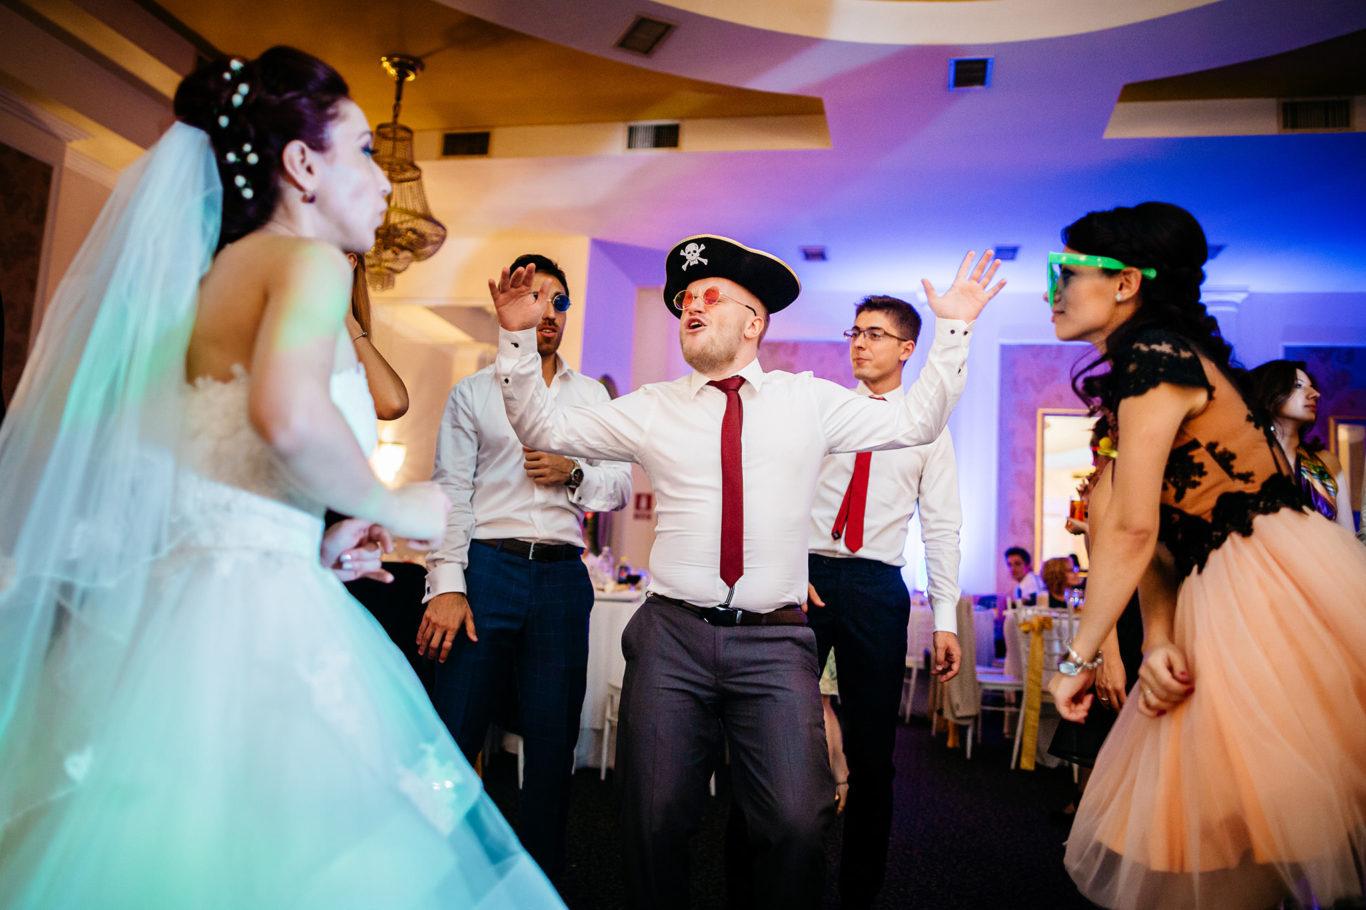 0638-fotografie-nunta-bucuresti-cristina-nicusor-fotograf-ciprian-dumitrescu-dc1_0329-2